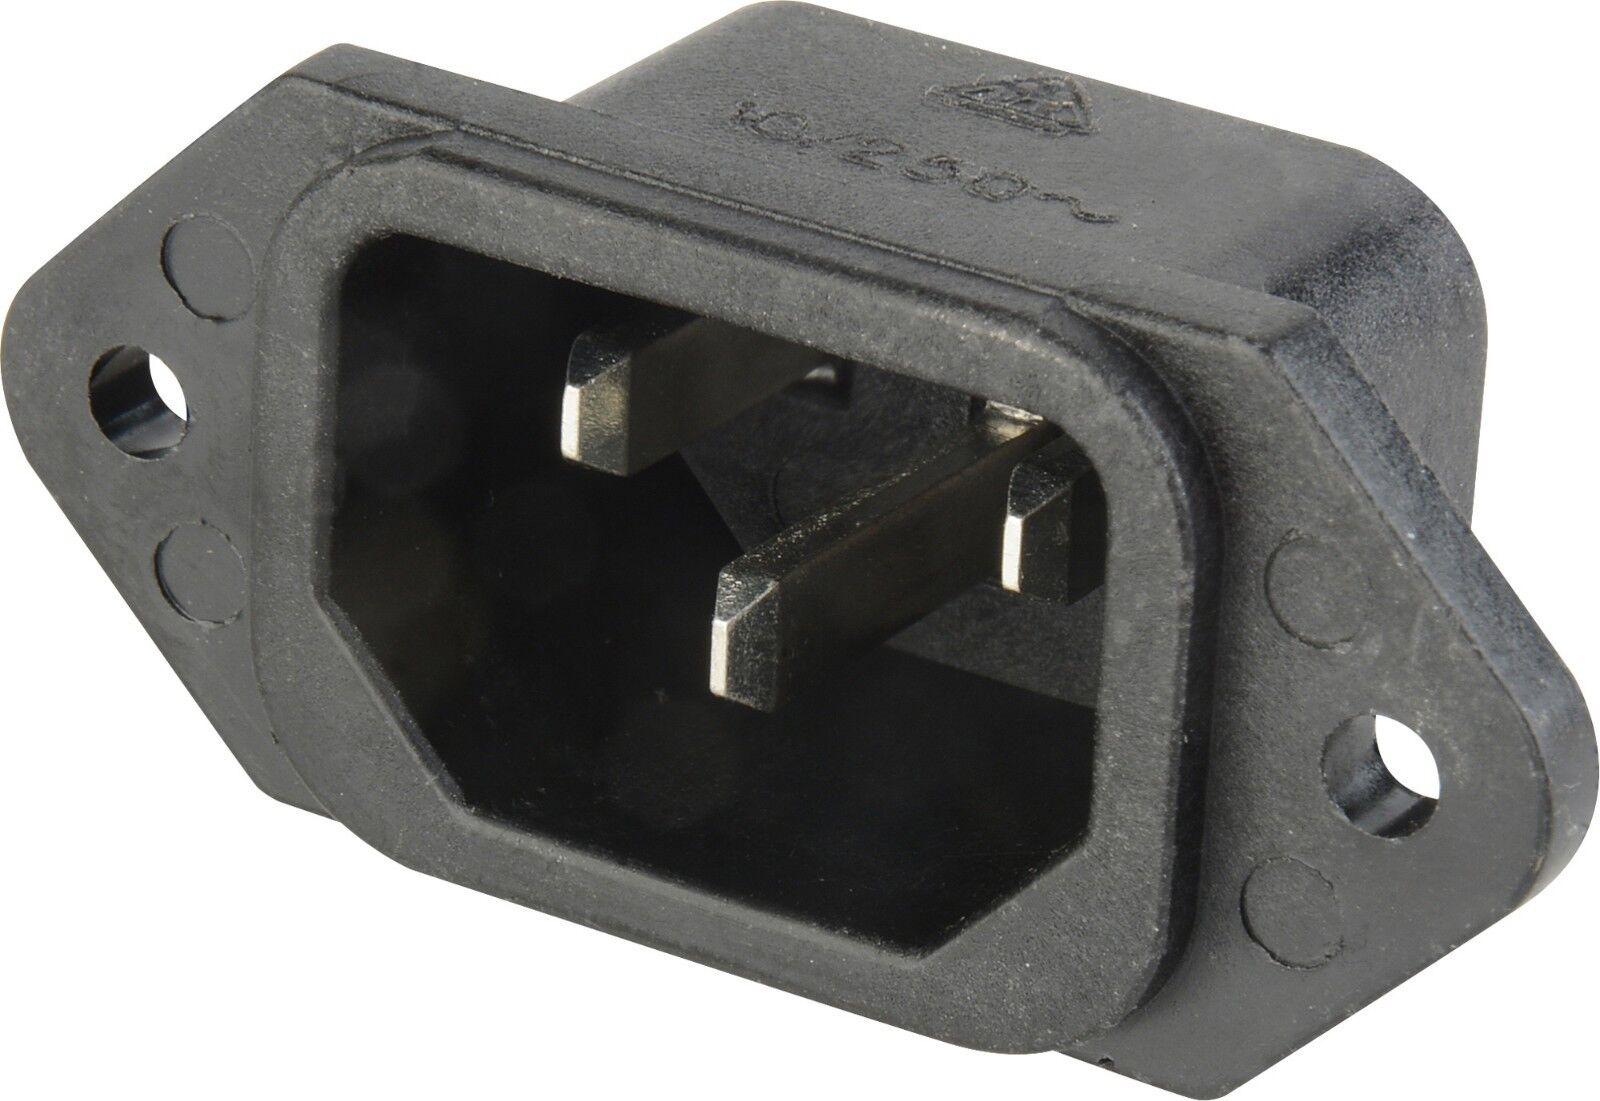 Carbide End Mill,404,2.0mm D,7mm Cut L OSG 404-0787